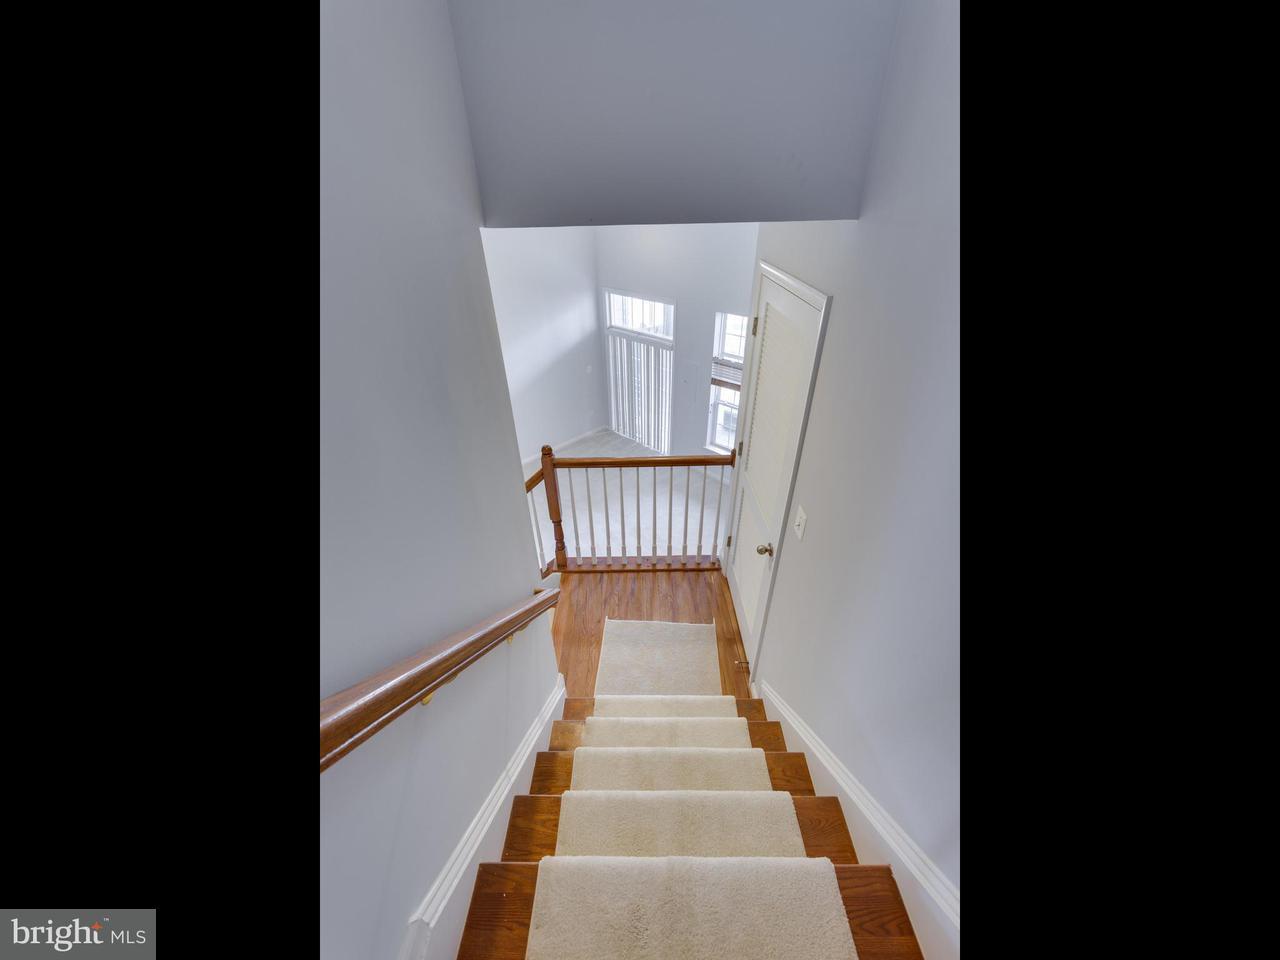 Additional photo for property listing at 4612 Carisbrooke Lane 4612 Carisbrooke Lane Fairfax, Βιρτζινια 22030 Ηνωμενεσ Πολιτειεσ